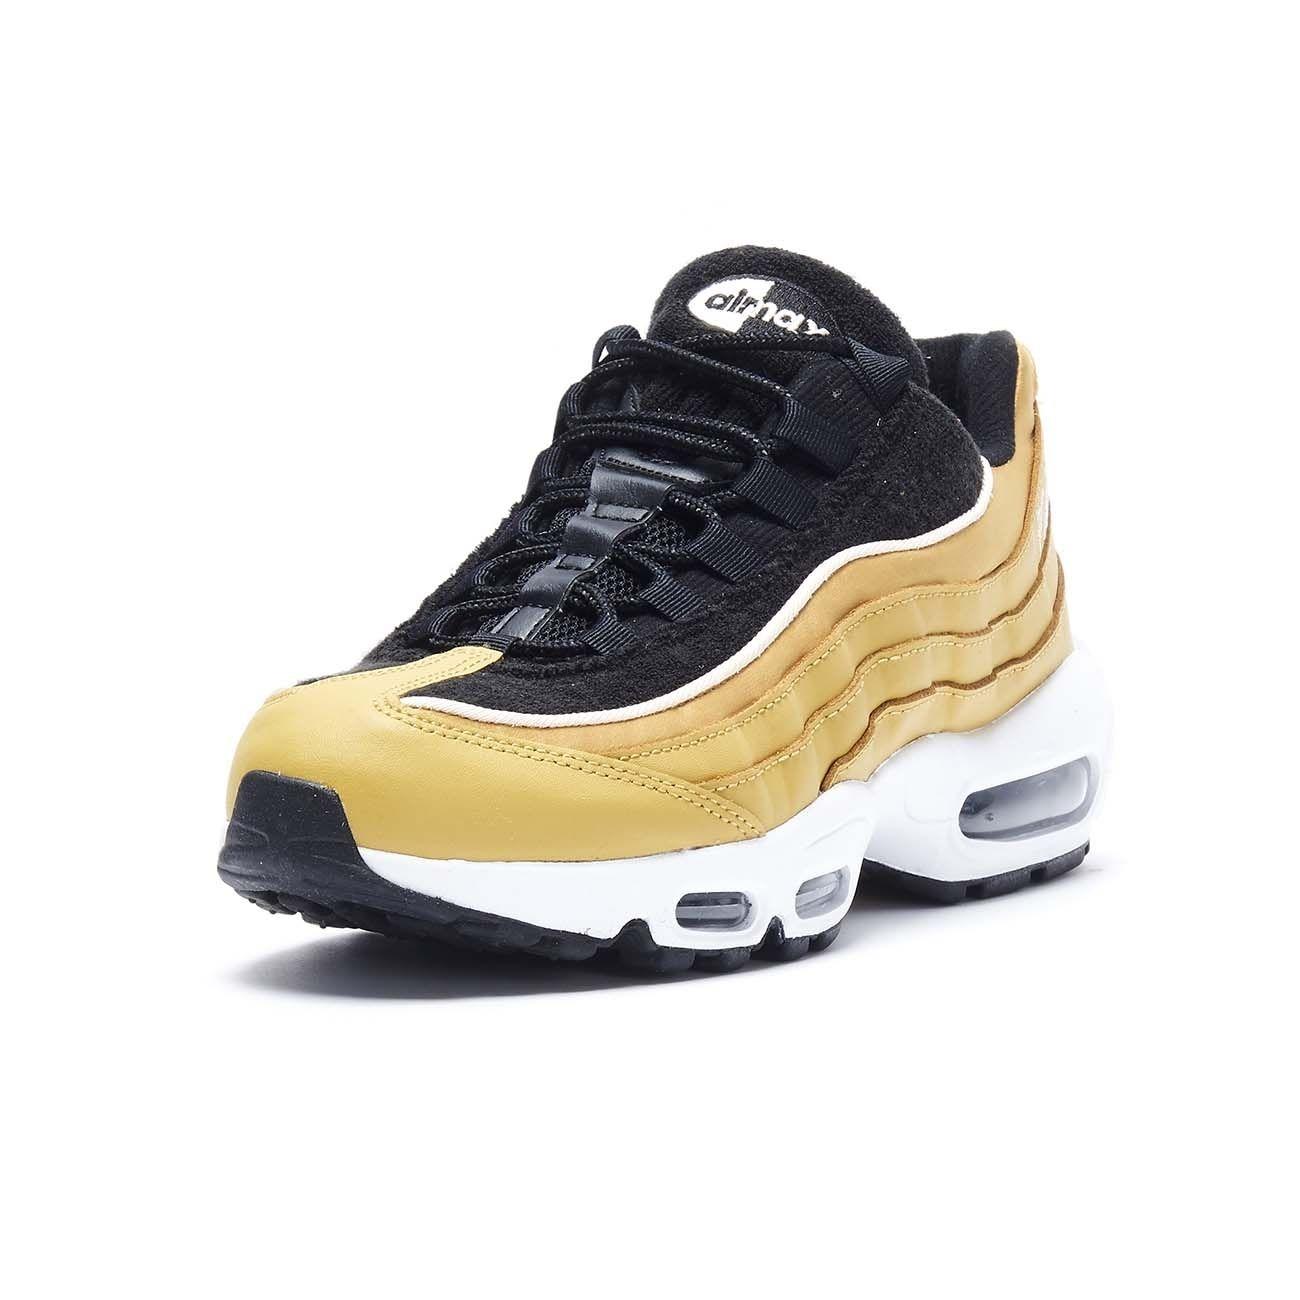 NIKE SNEAKERS AIR MAX 95 LX Woman Wheat gold   Mascheroni Sportswear